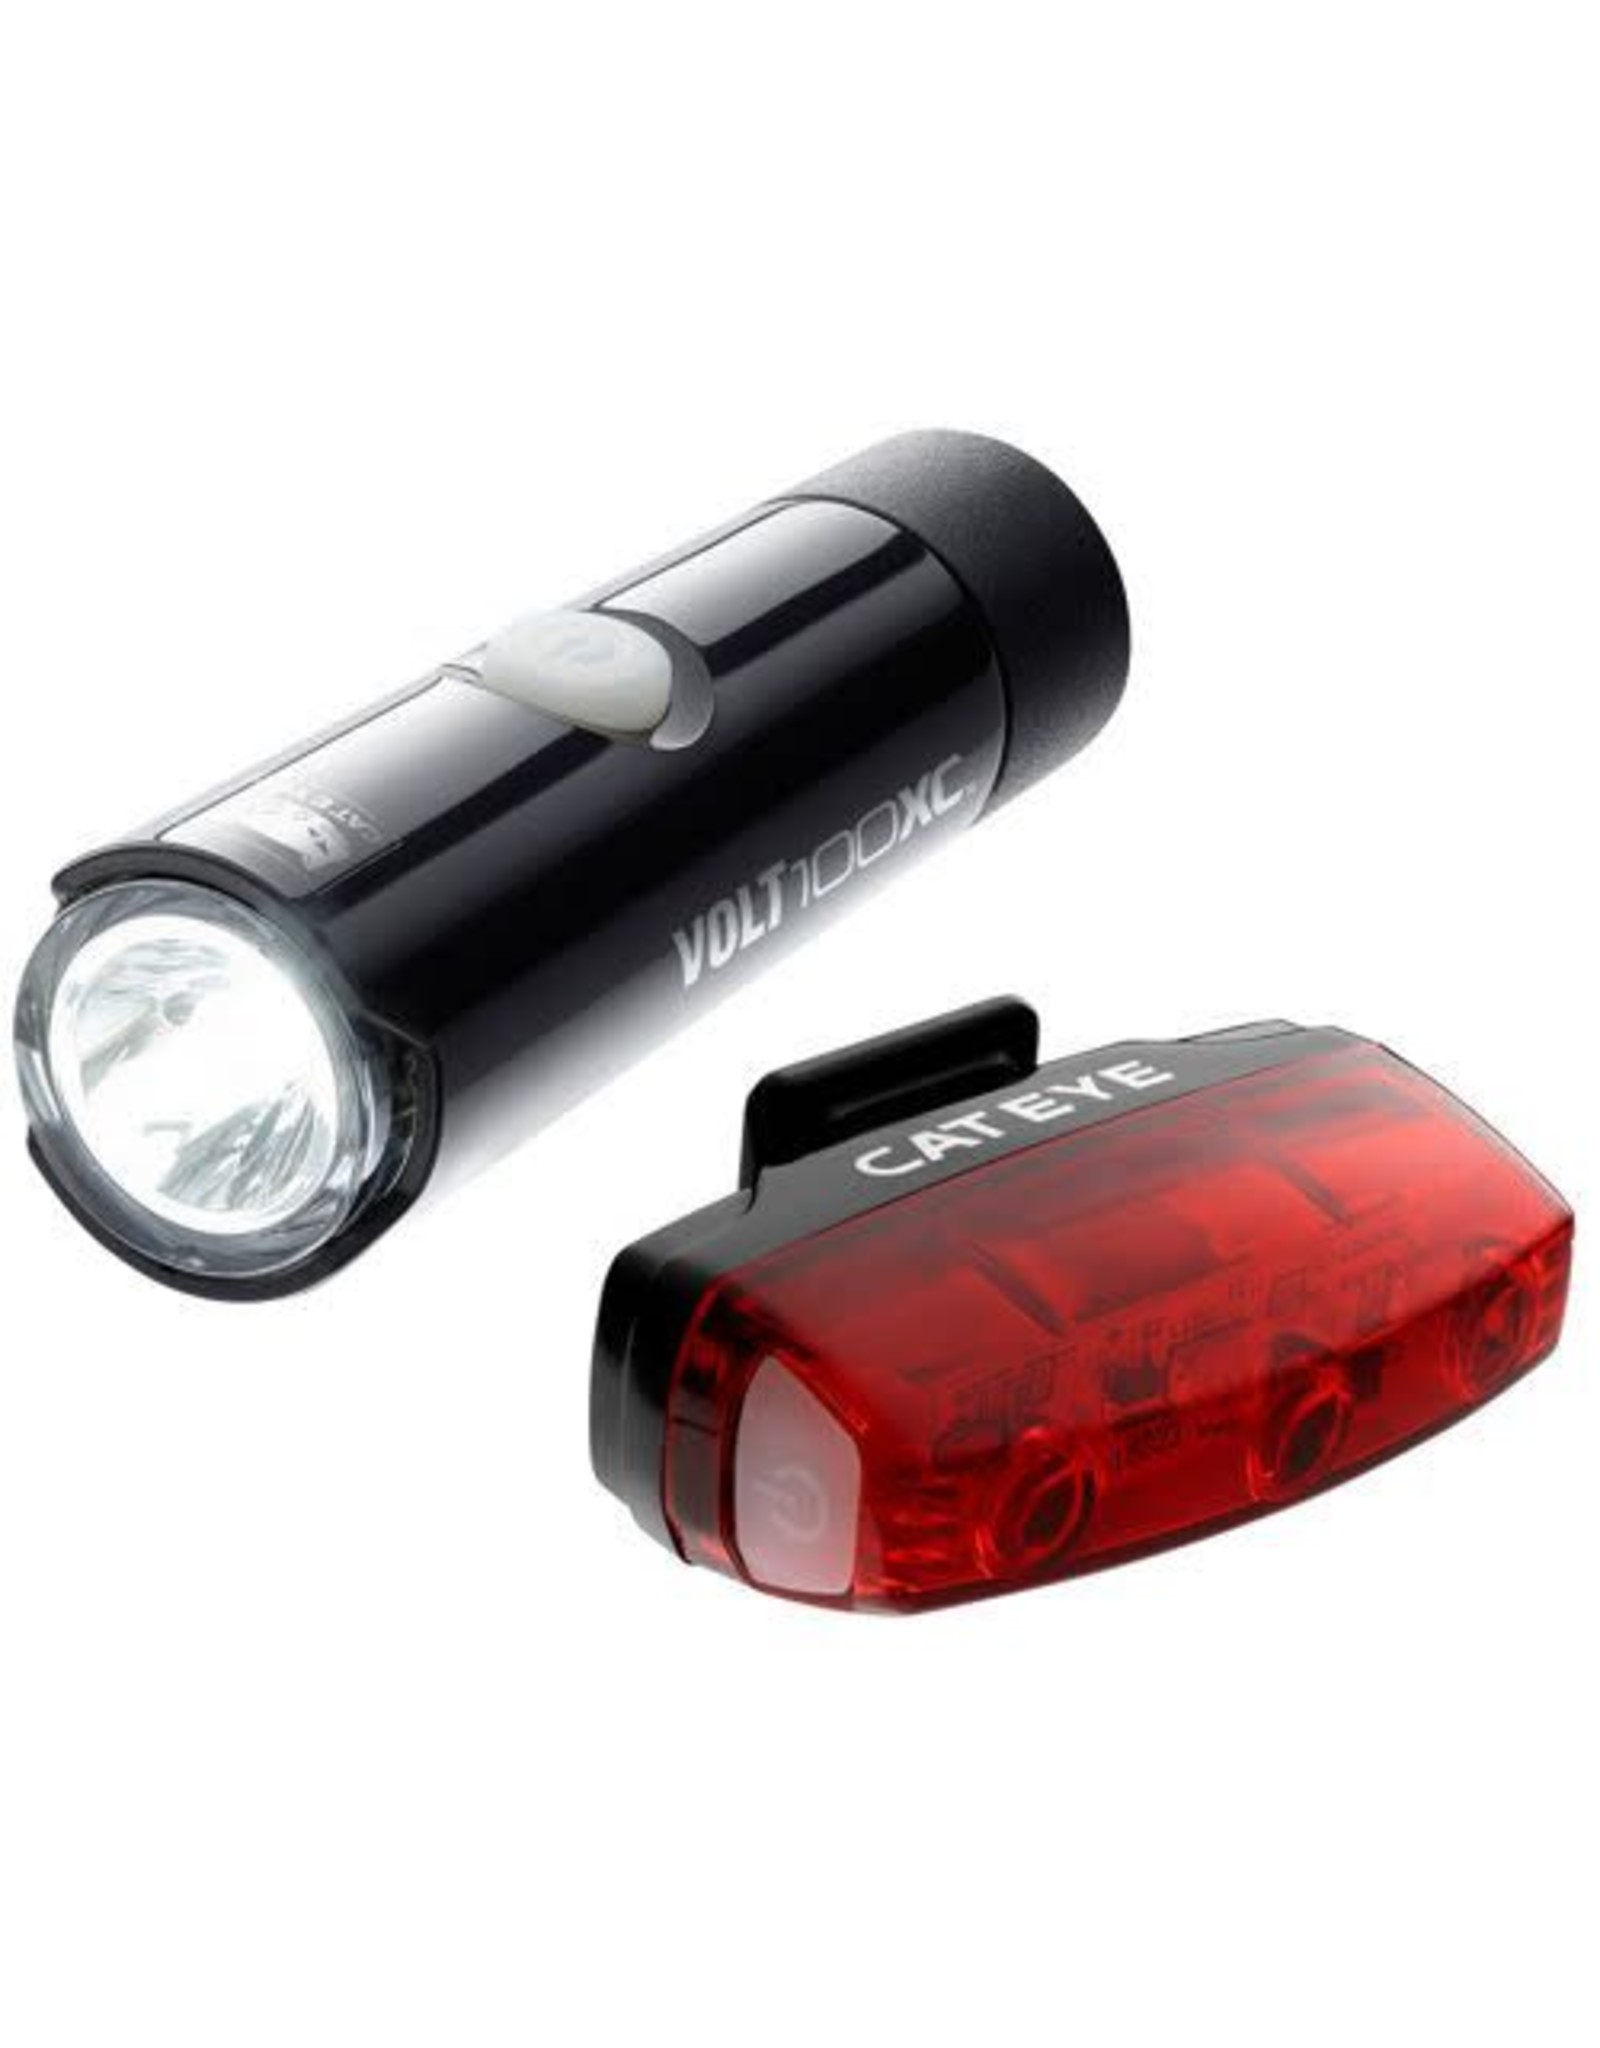 Cateye VOLT 100 XC FRONT LIGHT & RAPID MICRO REAR USB RECHARGEABLE LIGHT SET: